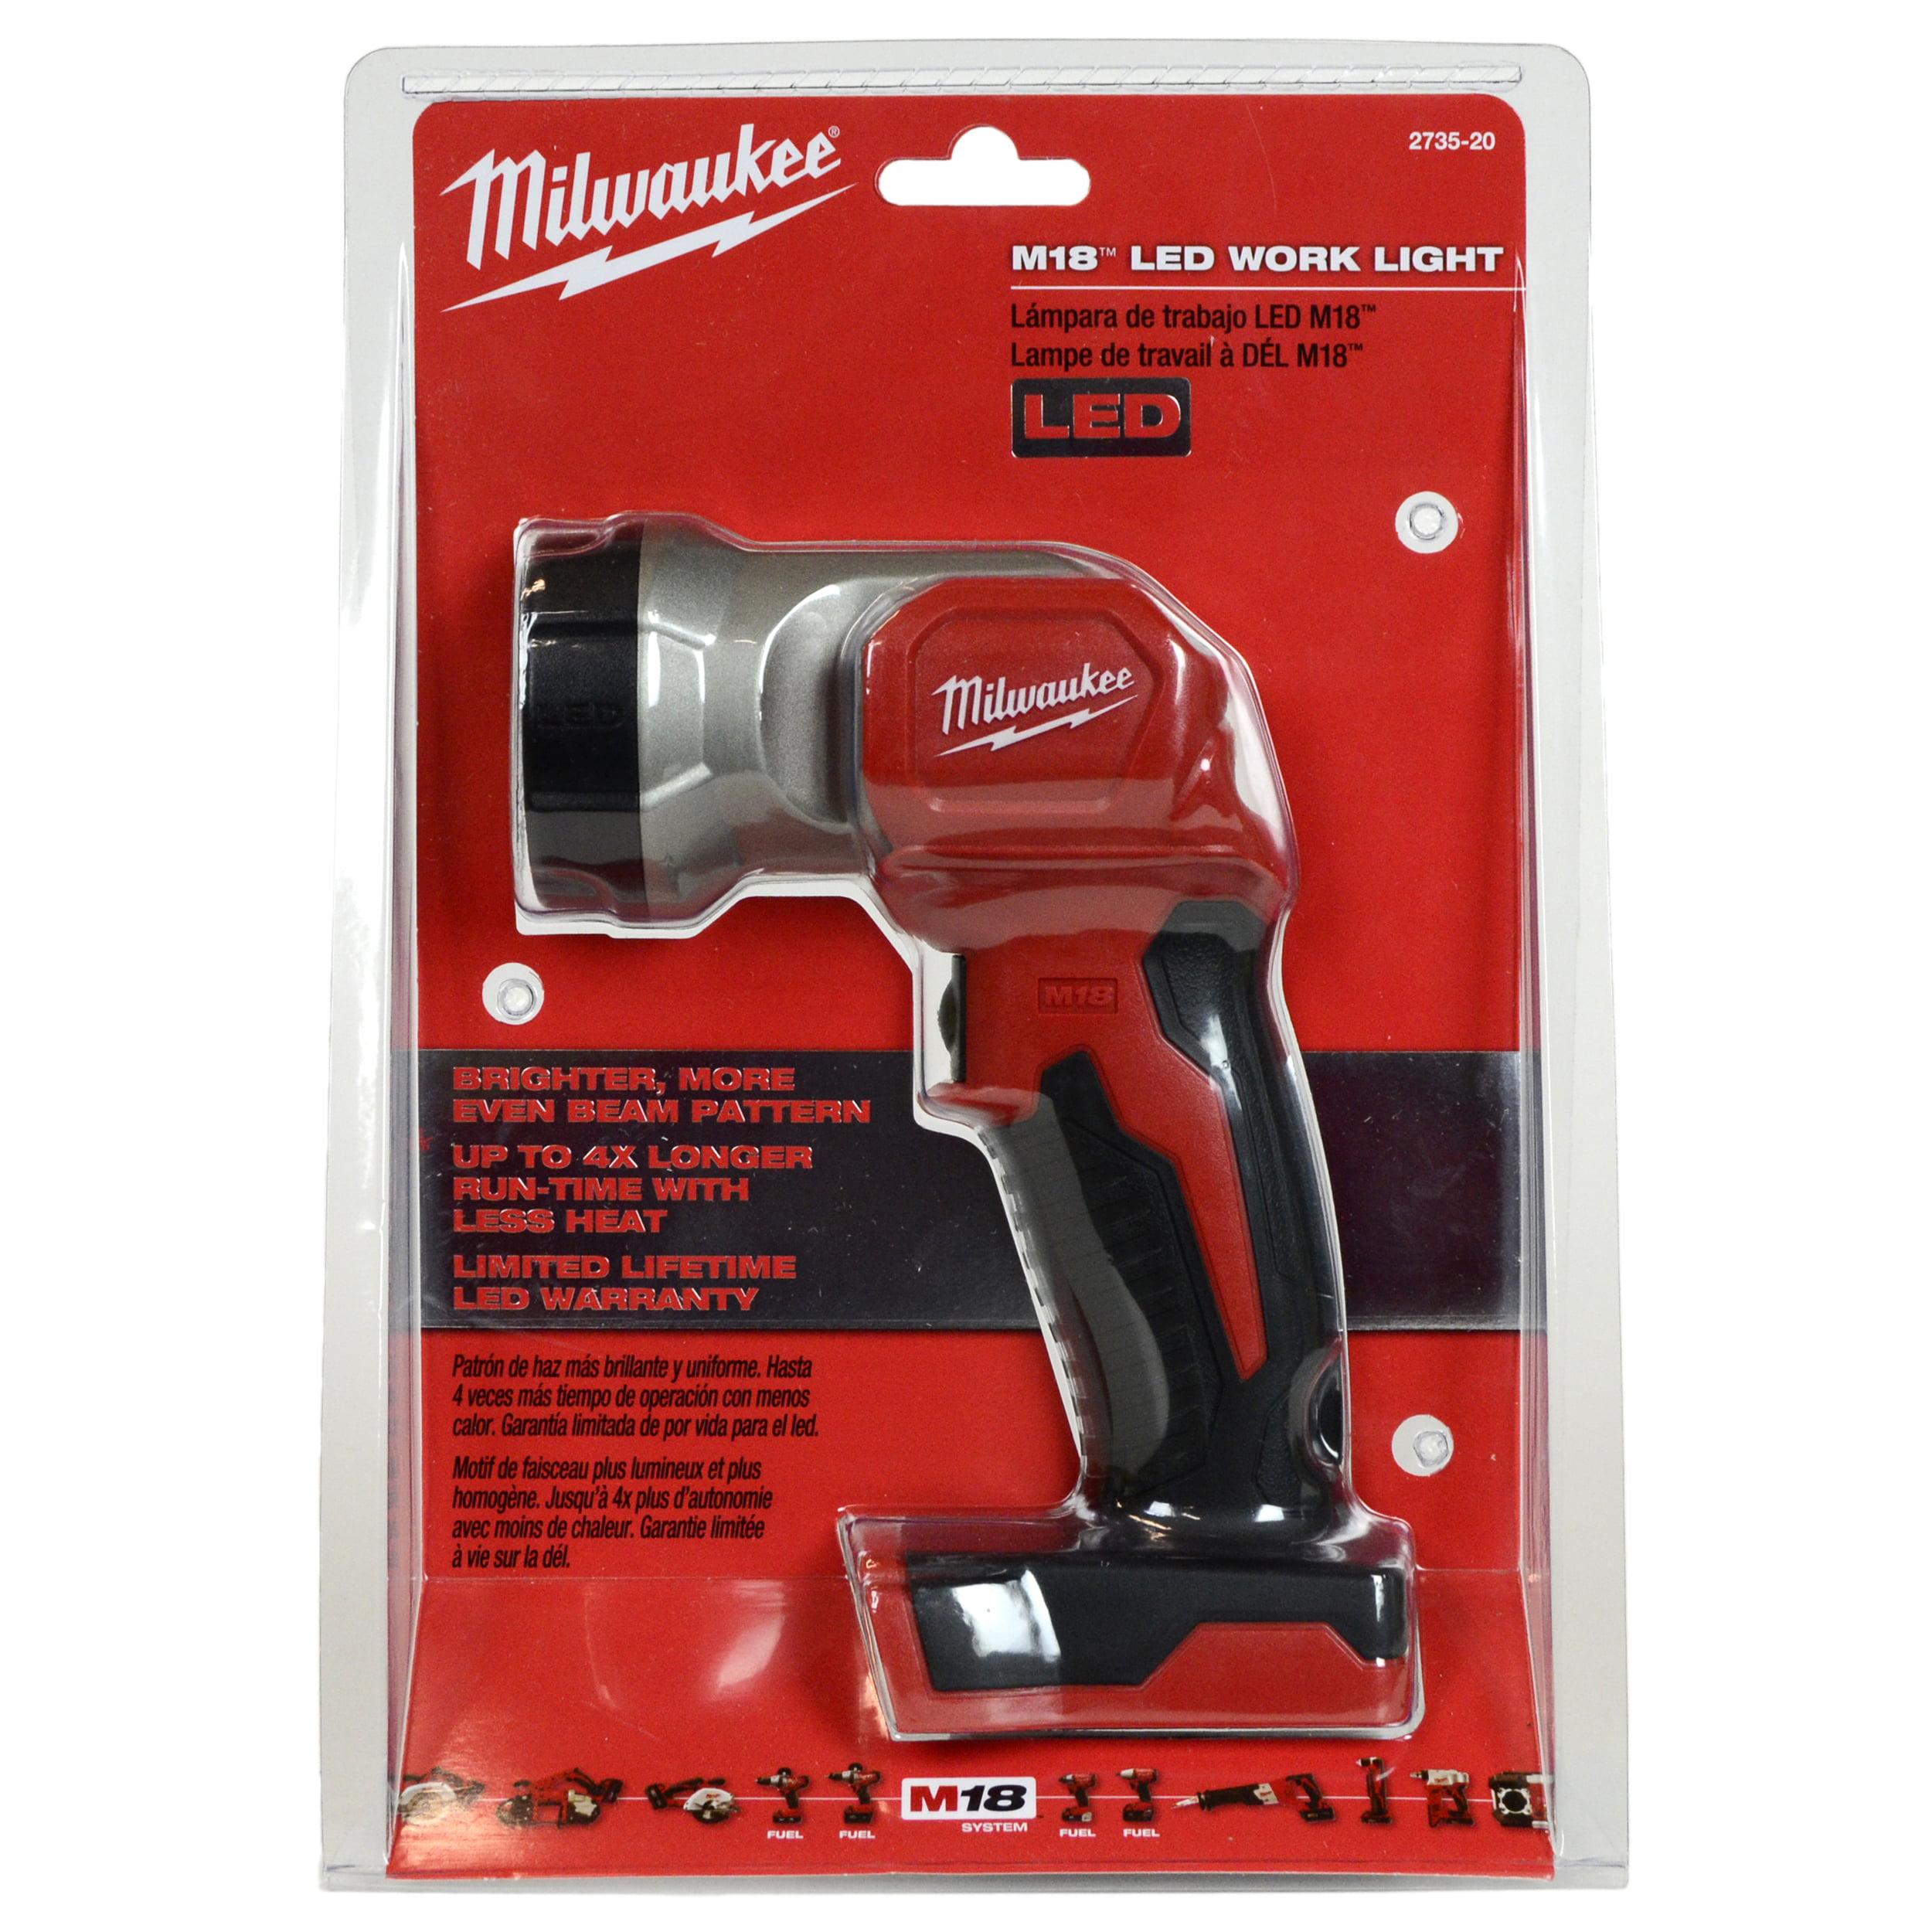 20 Torch Milwaukee 2735 Tool 18v Flashlight Tools WorklightBare Cordless Led M18 34j5qARL